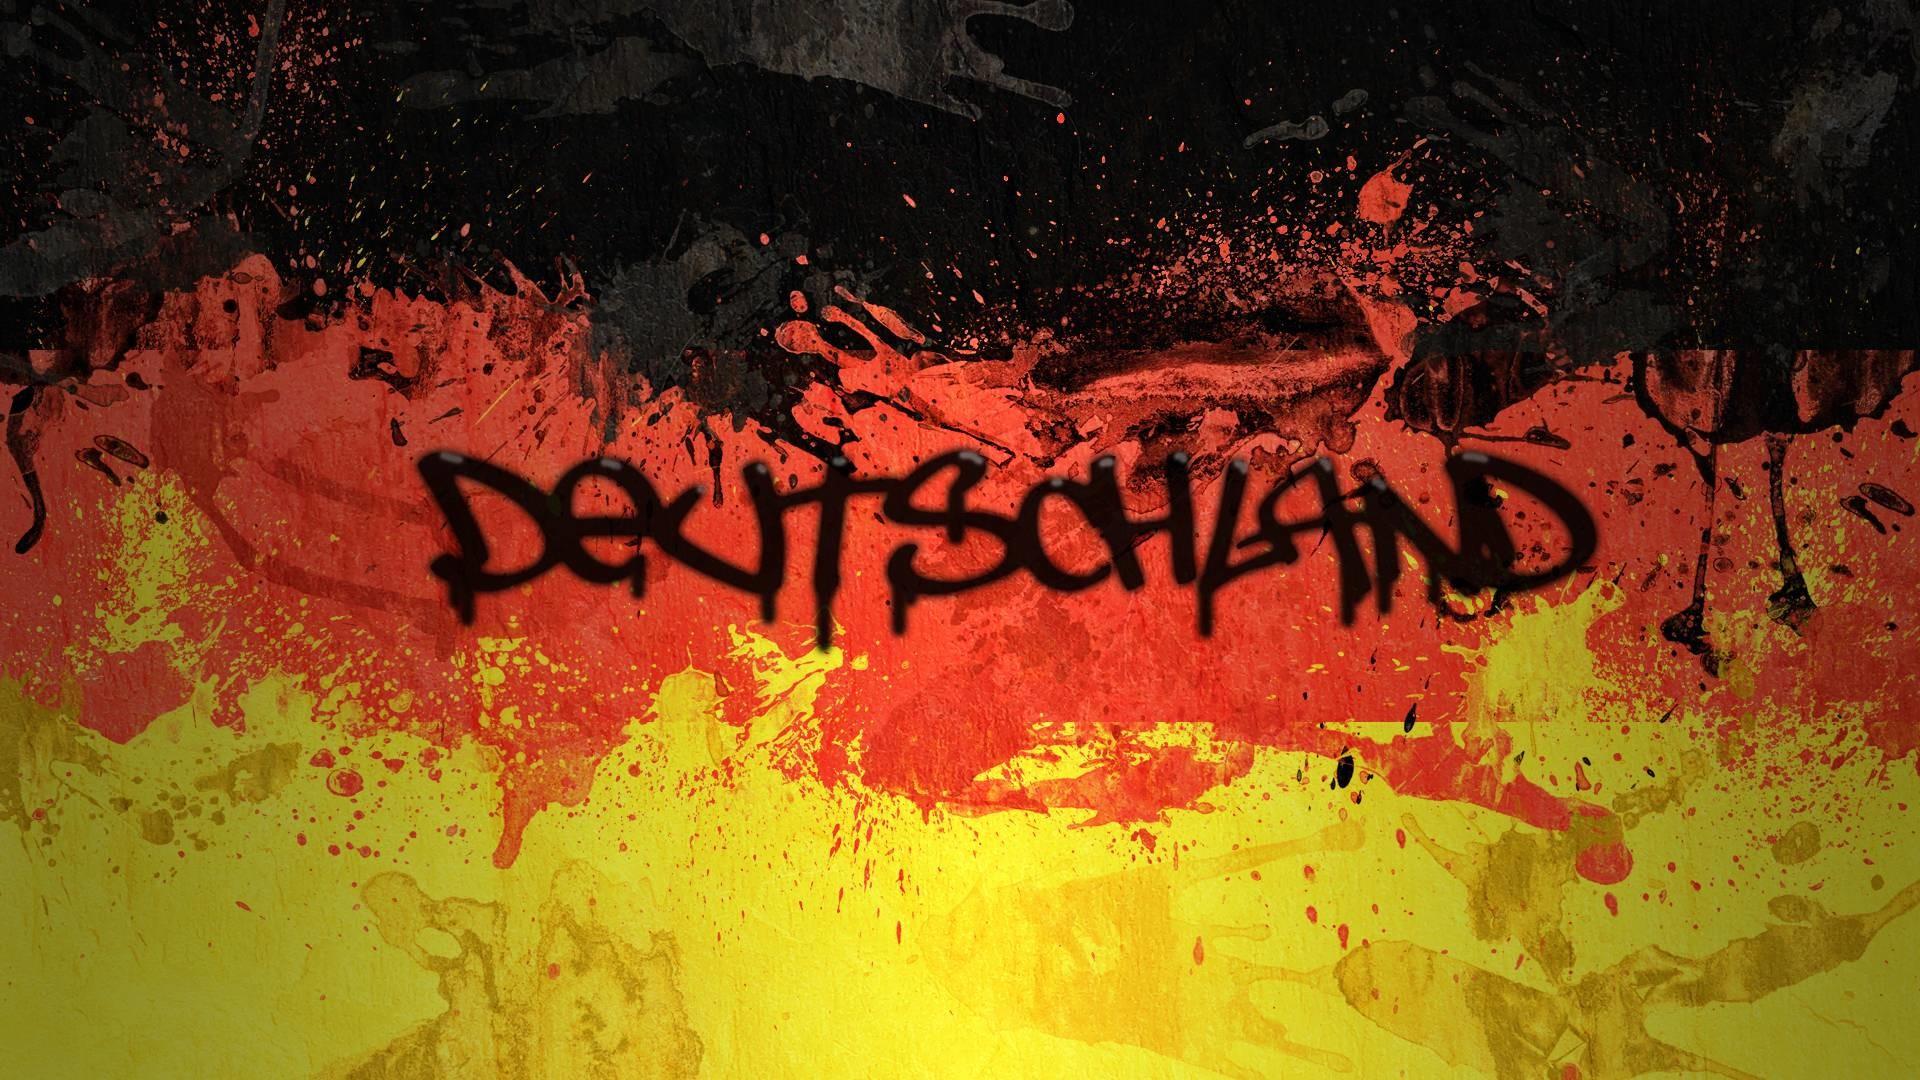 germany flag wallpaper 183��